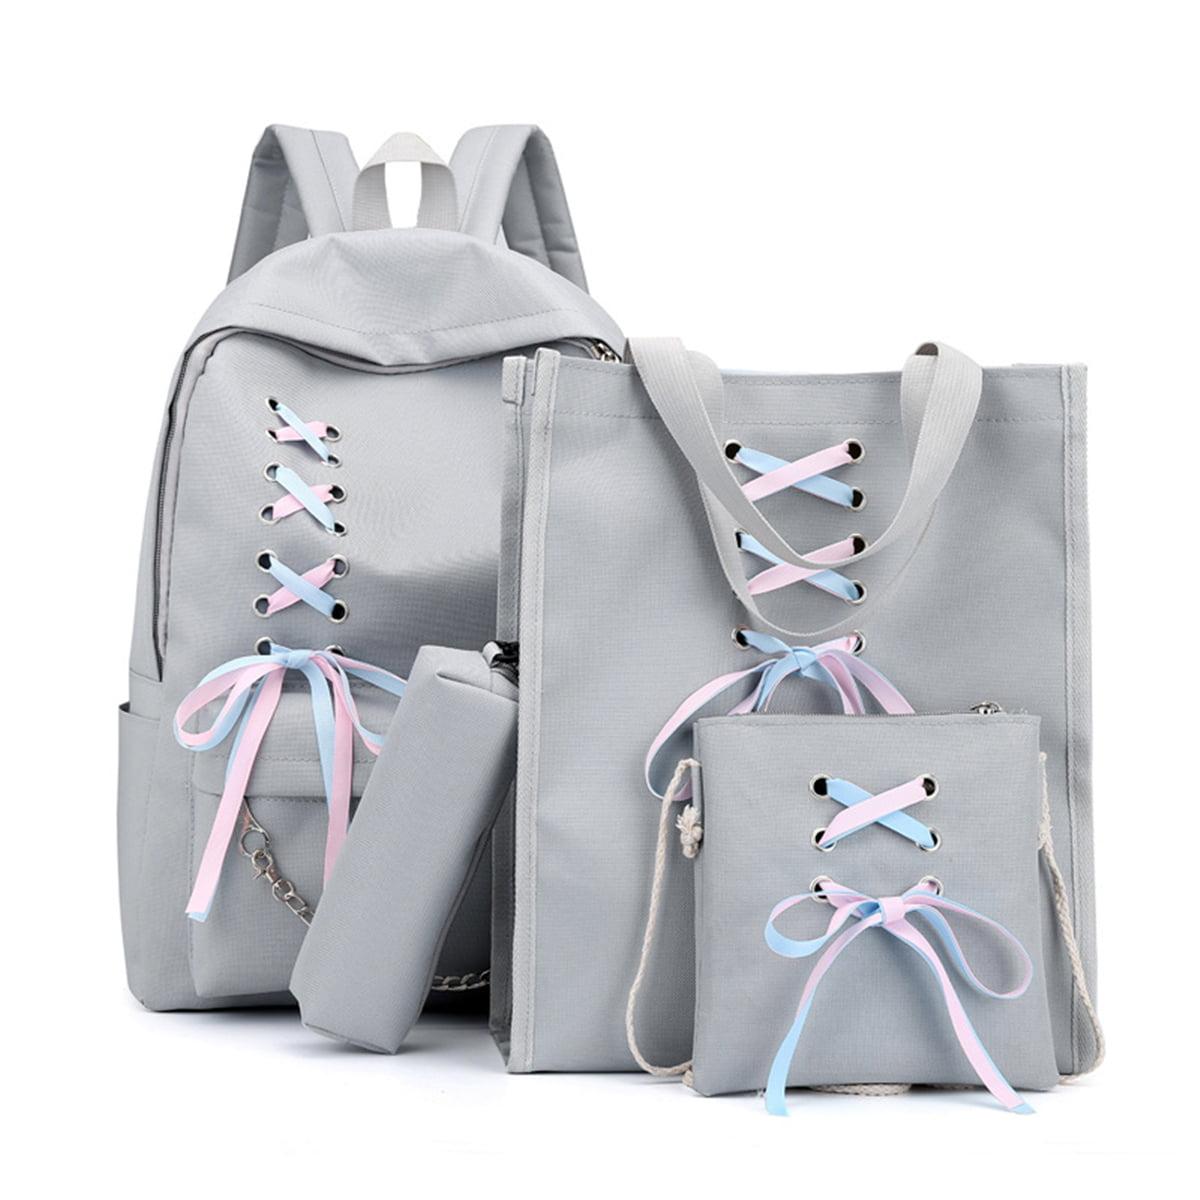 4Pcs//Set Ribbon Chain Bowknot Letter Canvas Backpack Travel Leisure Backpacks For Teenage Girls School 4pcs beige set 40cm